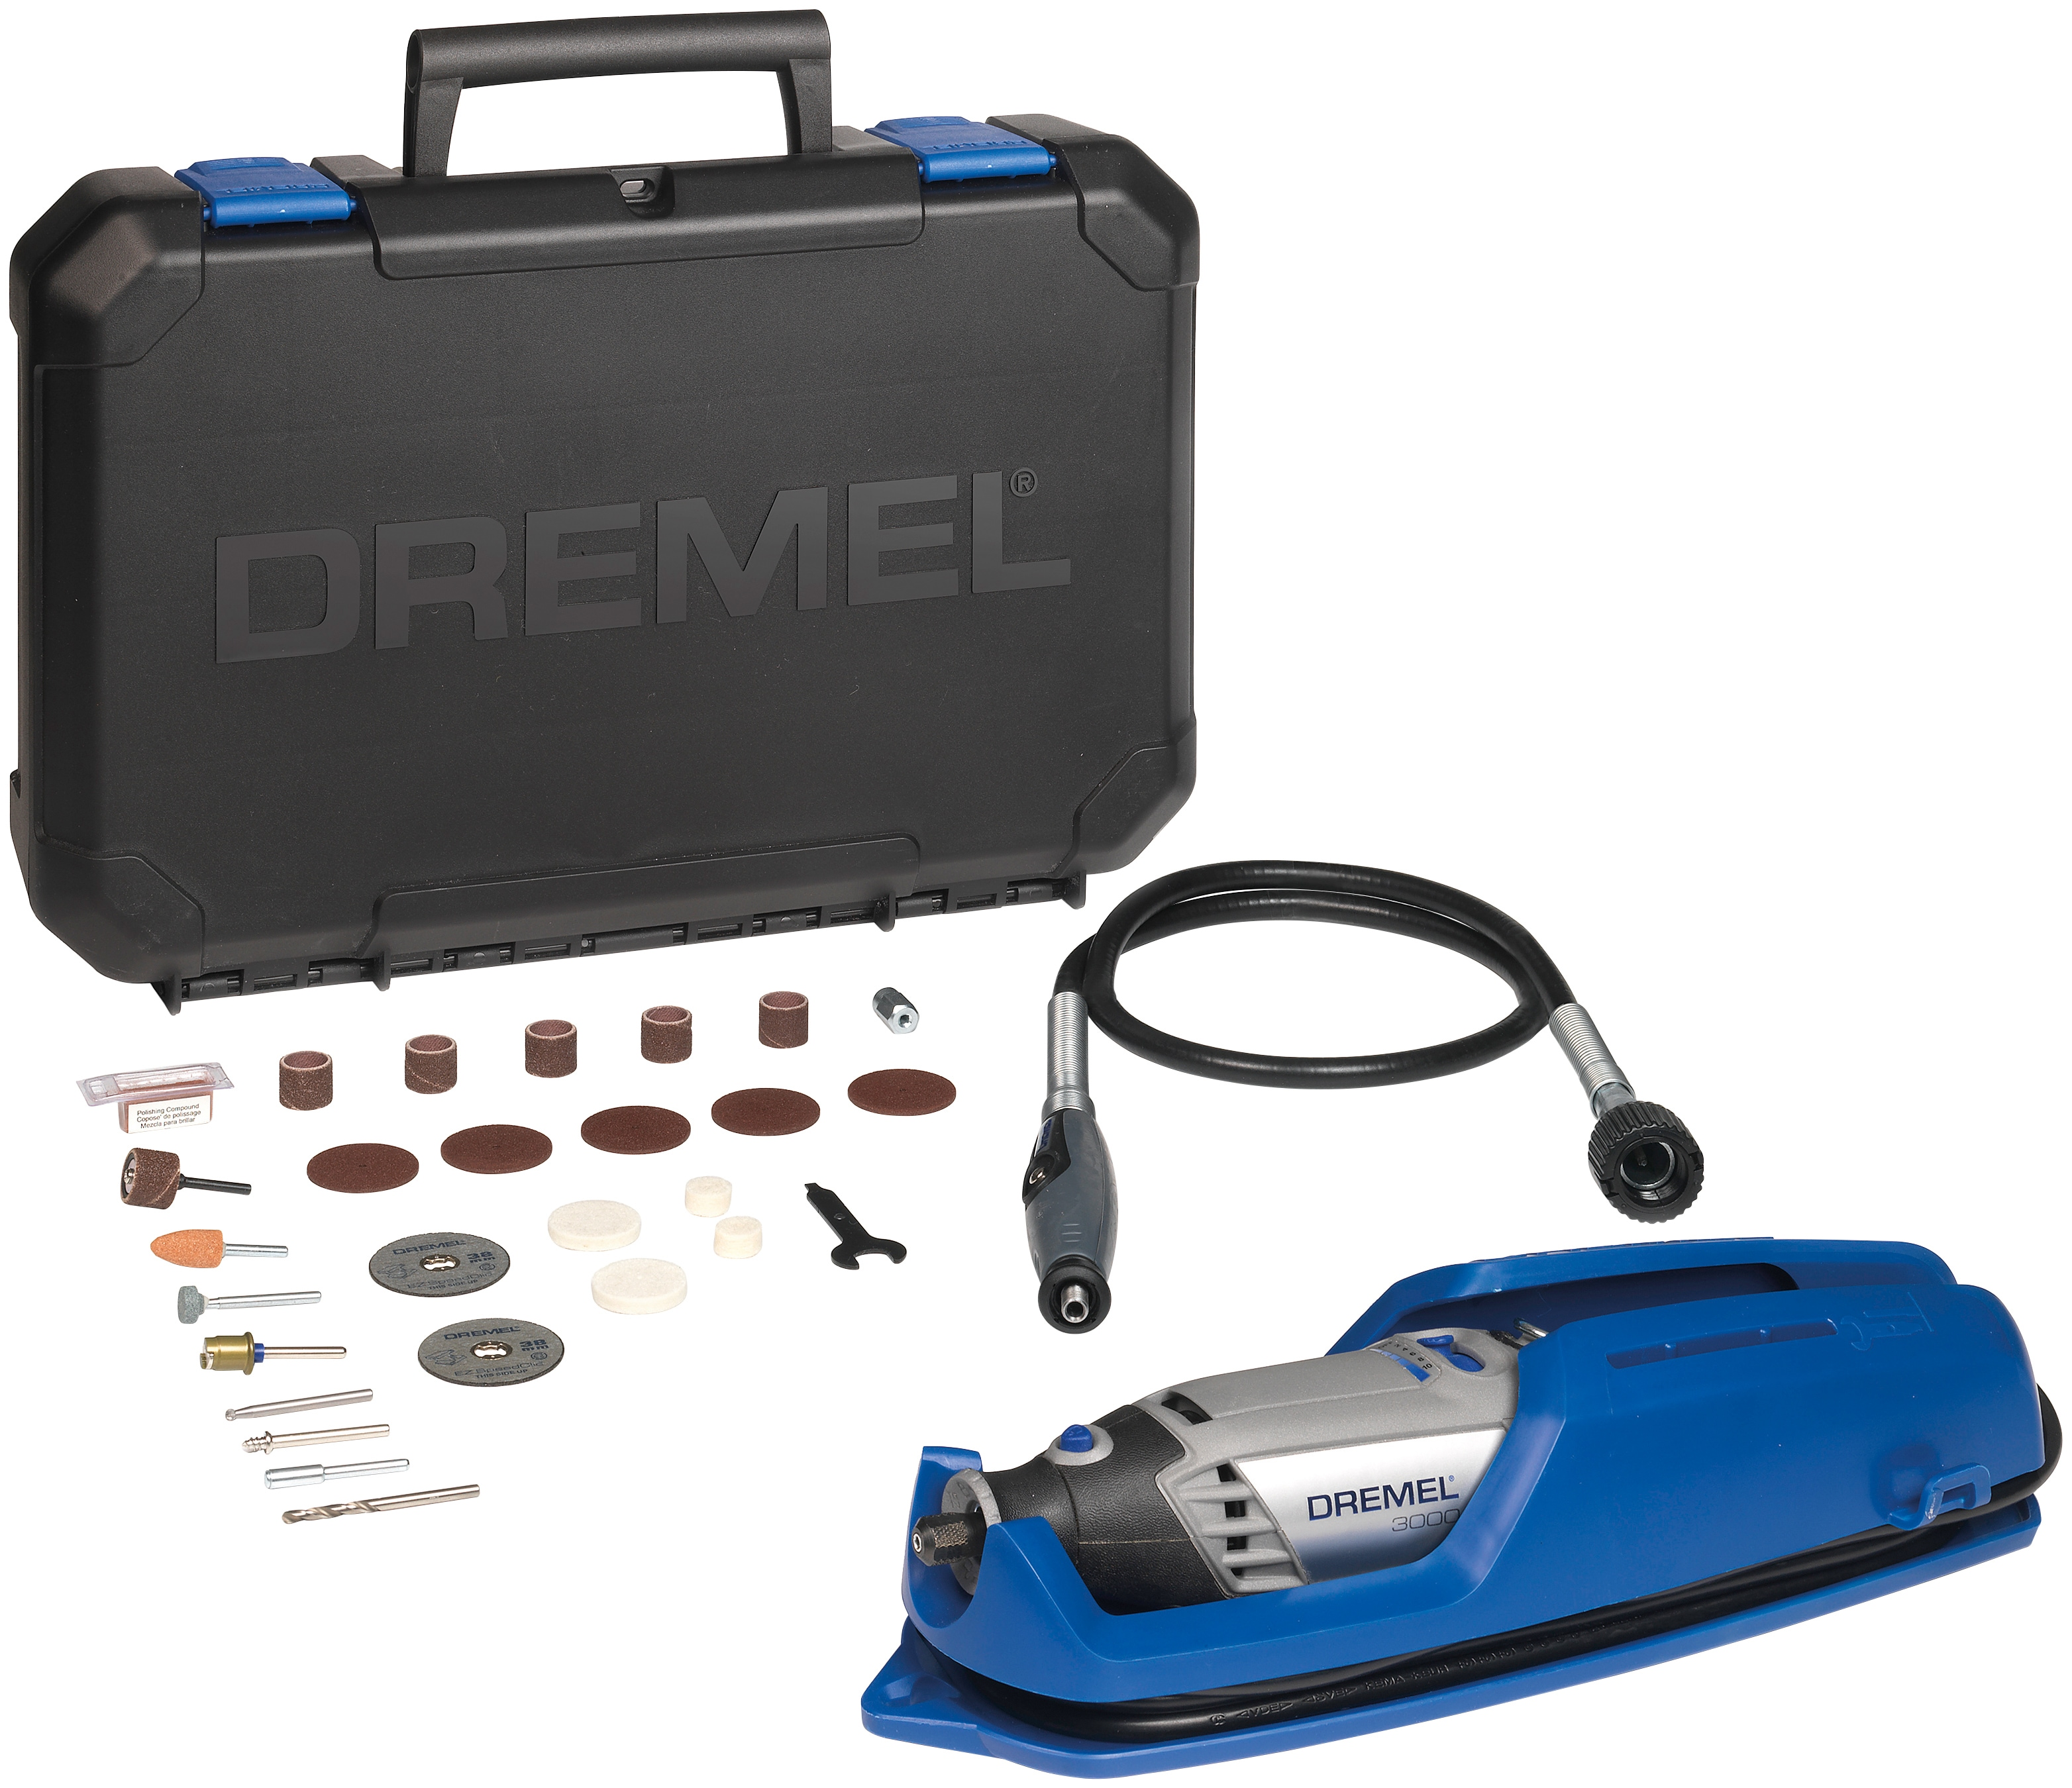 DREMEL Elektro-Multifunktionswerkzeug 3000-1/25 EZ grau Multifunktionswerkzeug Werkzeug Maschinen